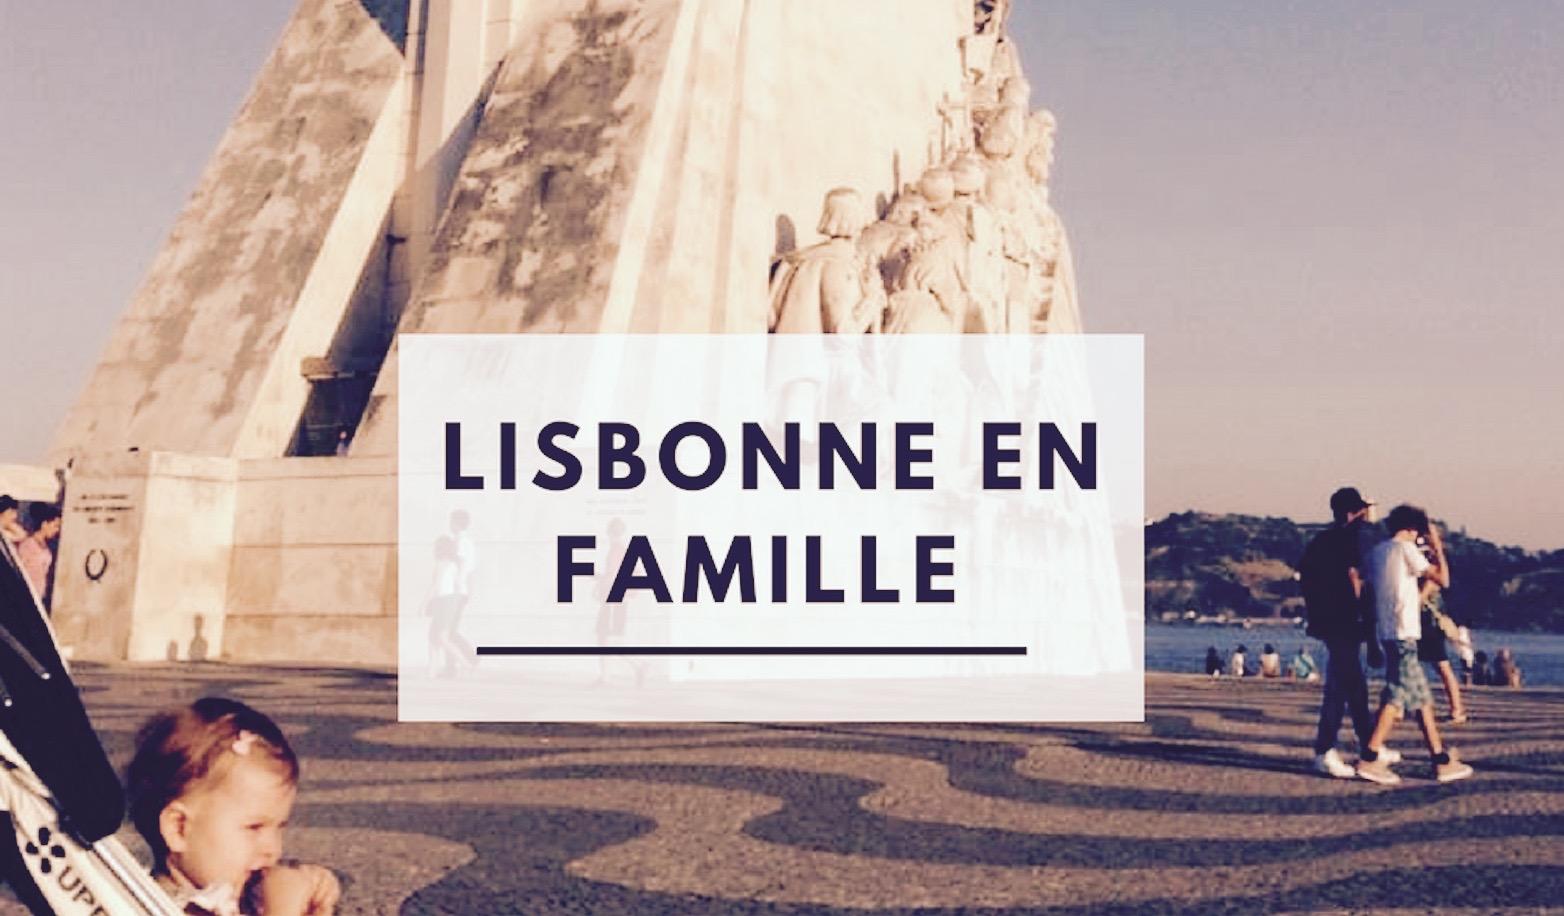 Lisbonne en famille avec enfants